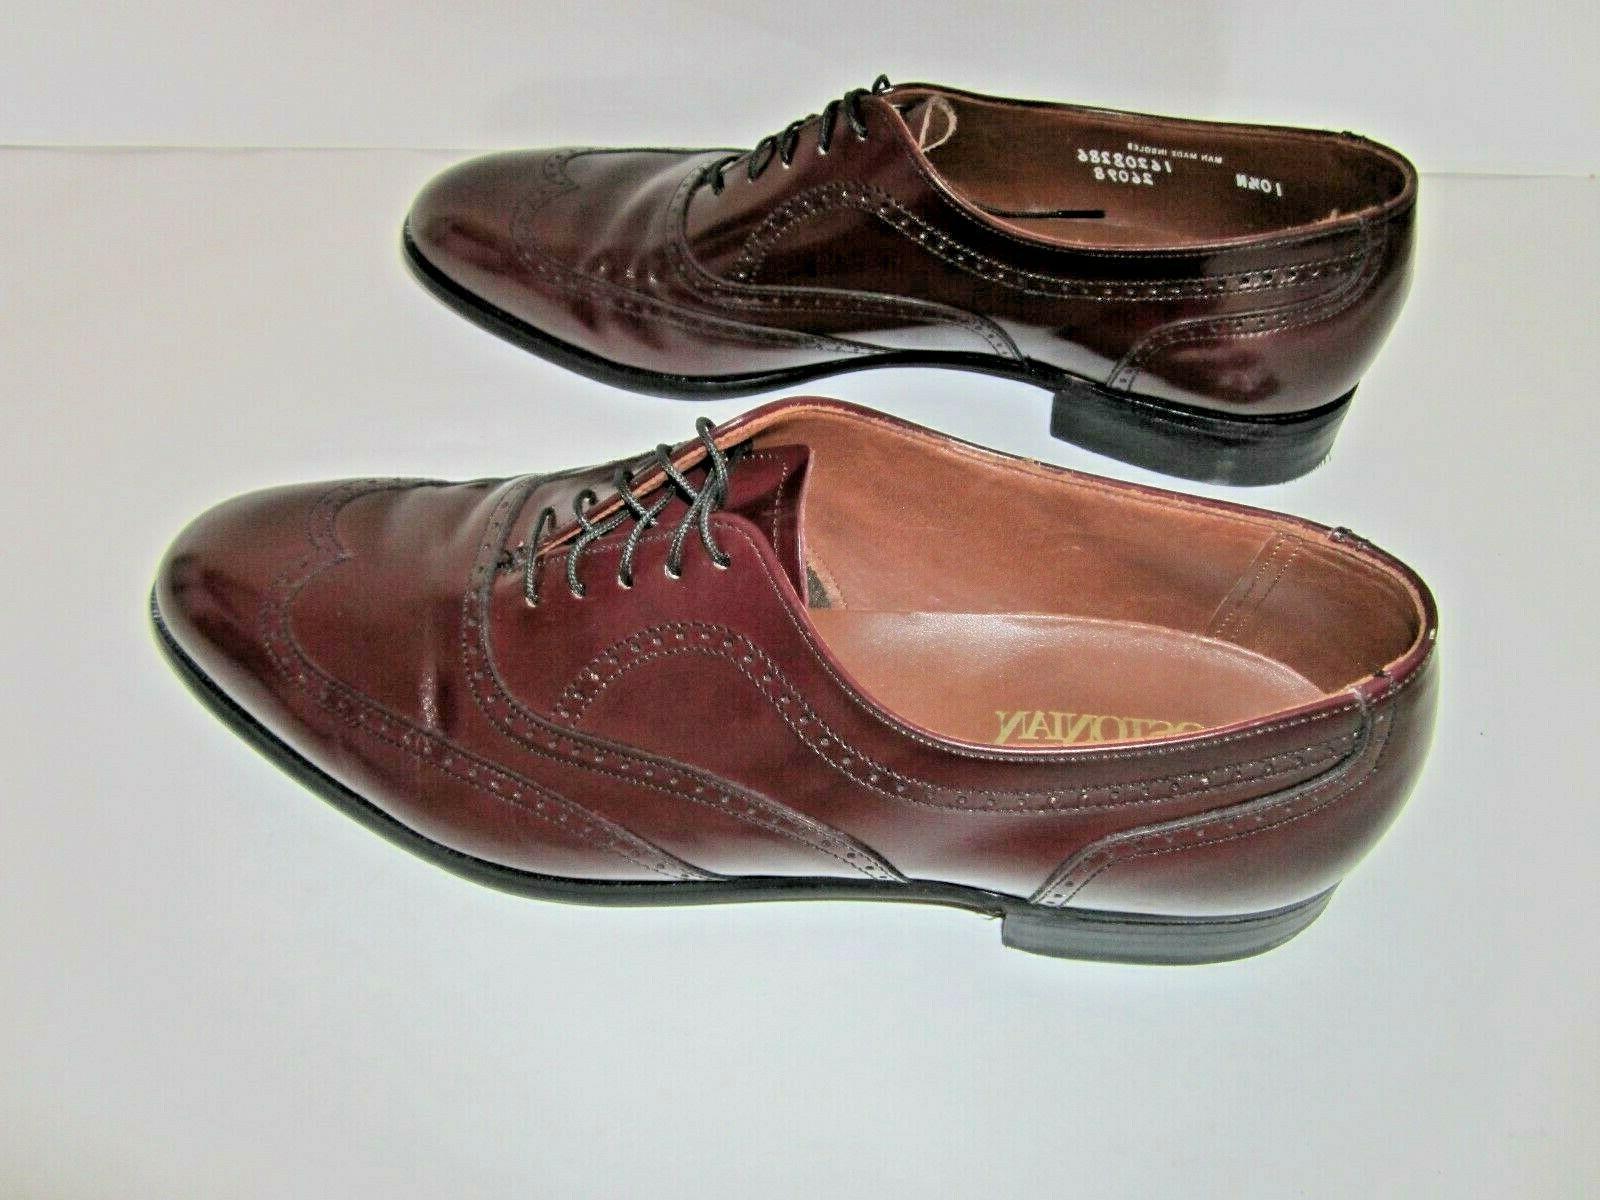 Wingtip Shoes 10.5 in